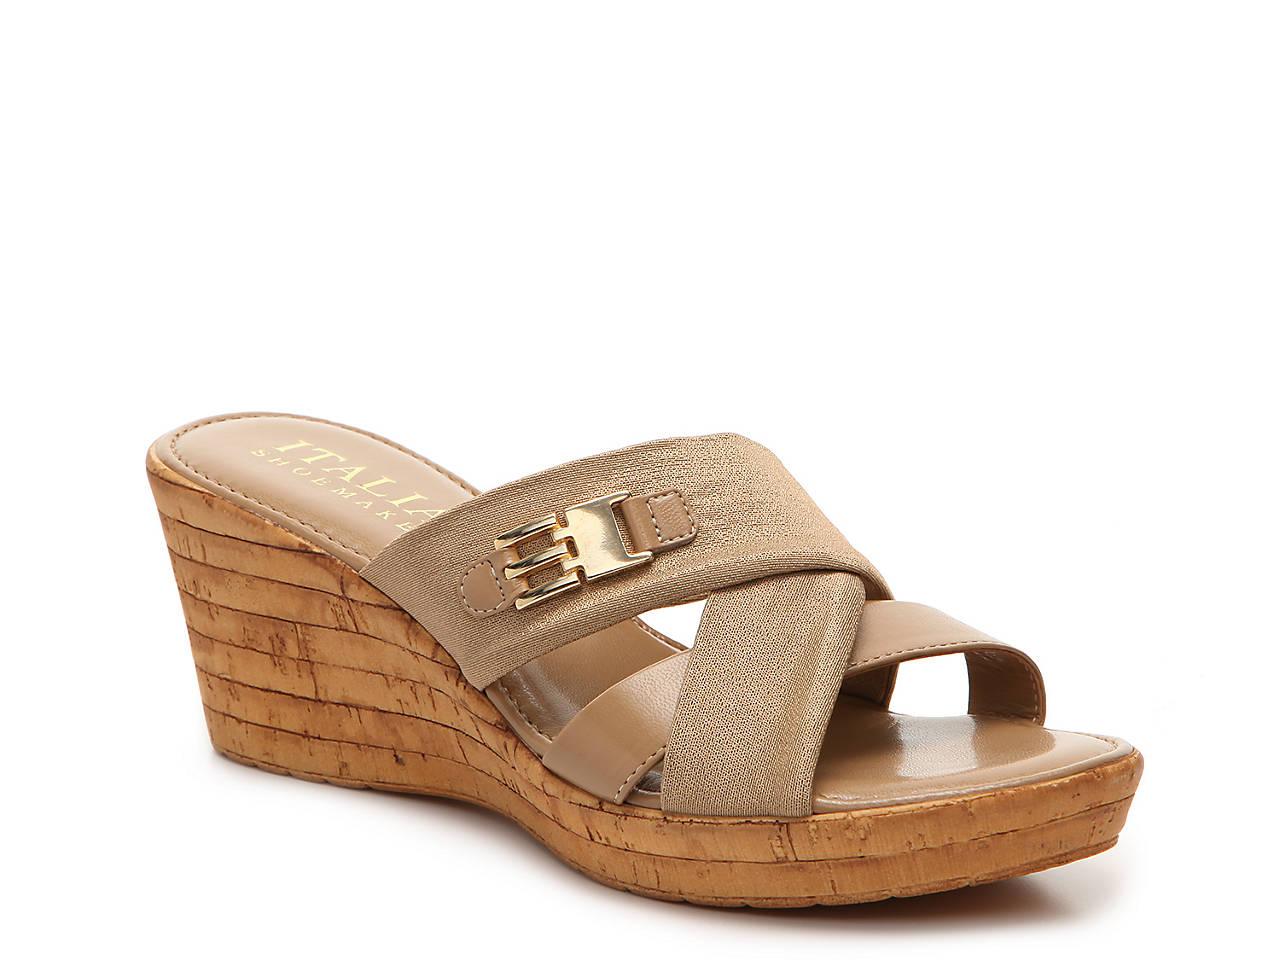 2344ec6542c9 Italian Shoemakers Sunbeam Wedge Sandal Women s Shoes